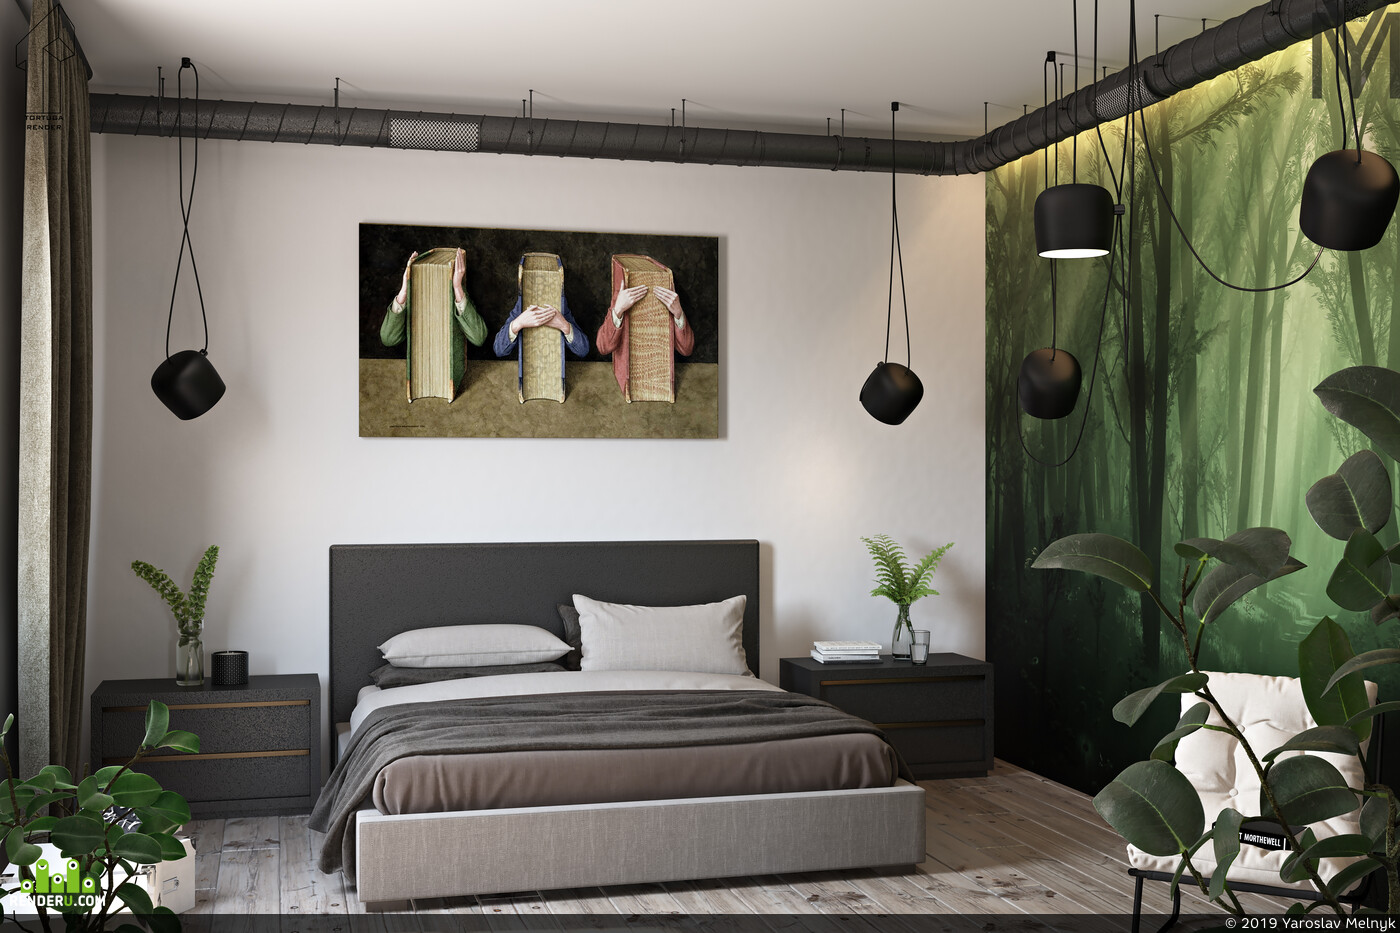 библиотека, дизайн интерьера, interior interior design design 3D 3D Studio Max 3D архитектура интерьер дизайн интерьера интерьер, visualization